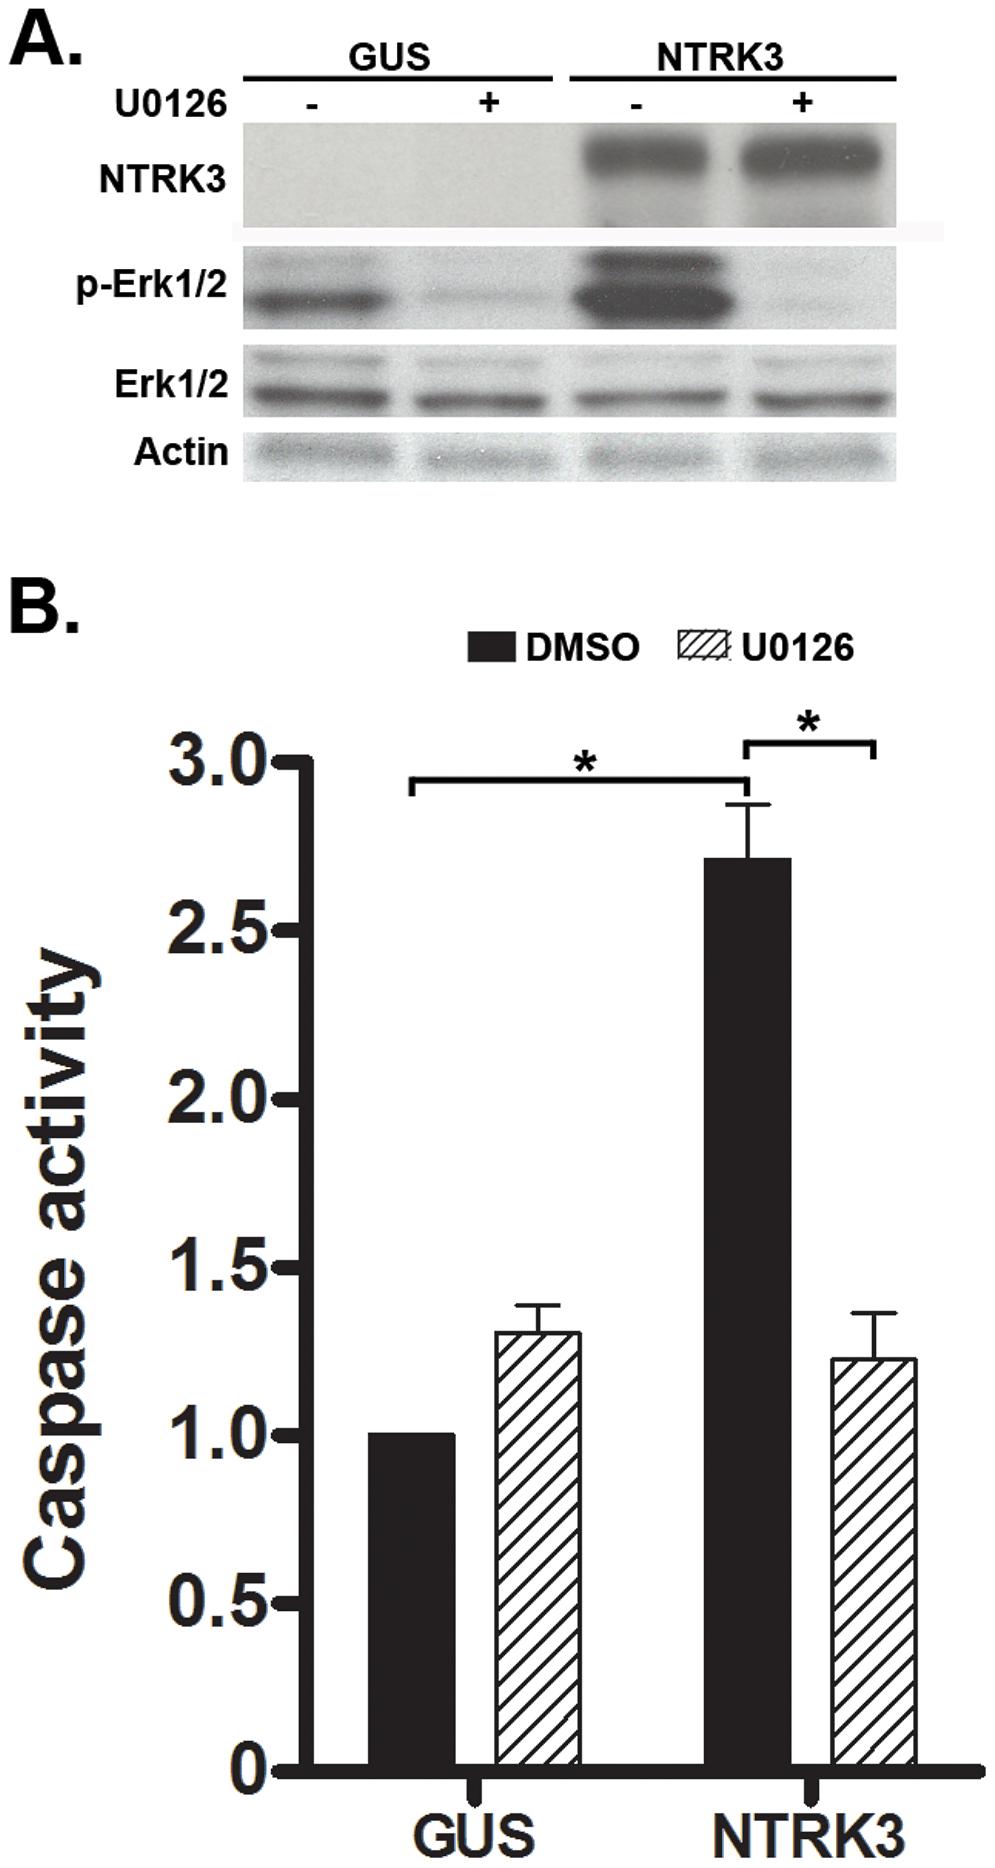 NTRK3 expression induces phosphorylation of Erk1/2 (Thr202/Tyr204), and the inhibition of phosphorylation of Erk1/2 correlates with decreased apoptosis induced by NTRK3.